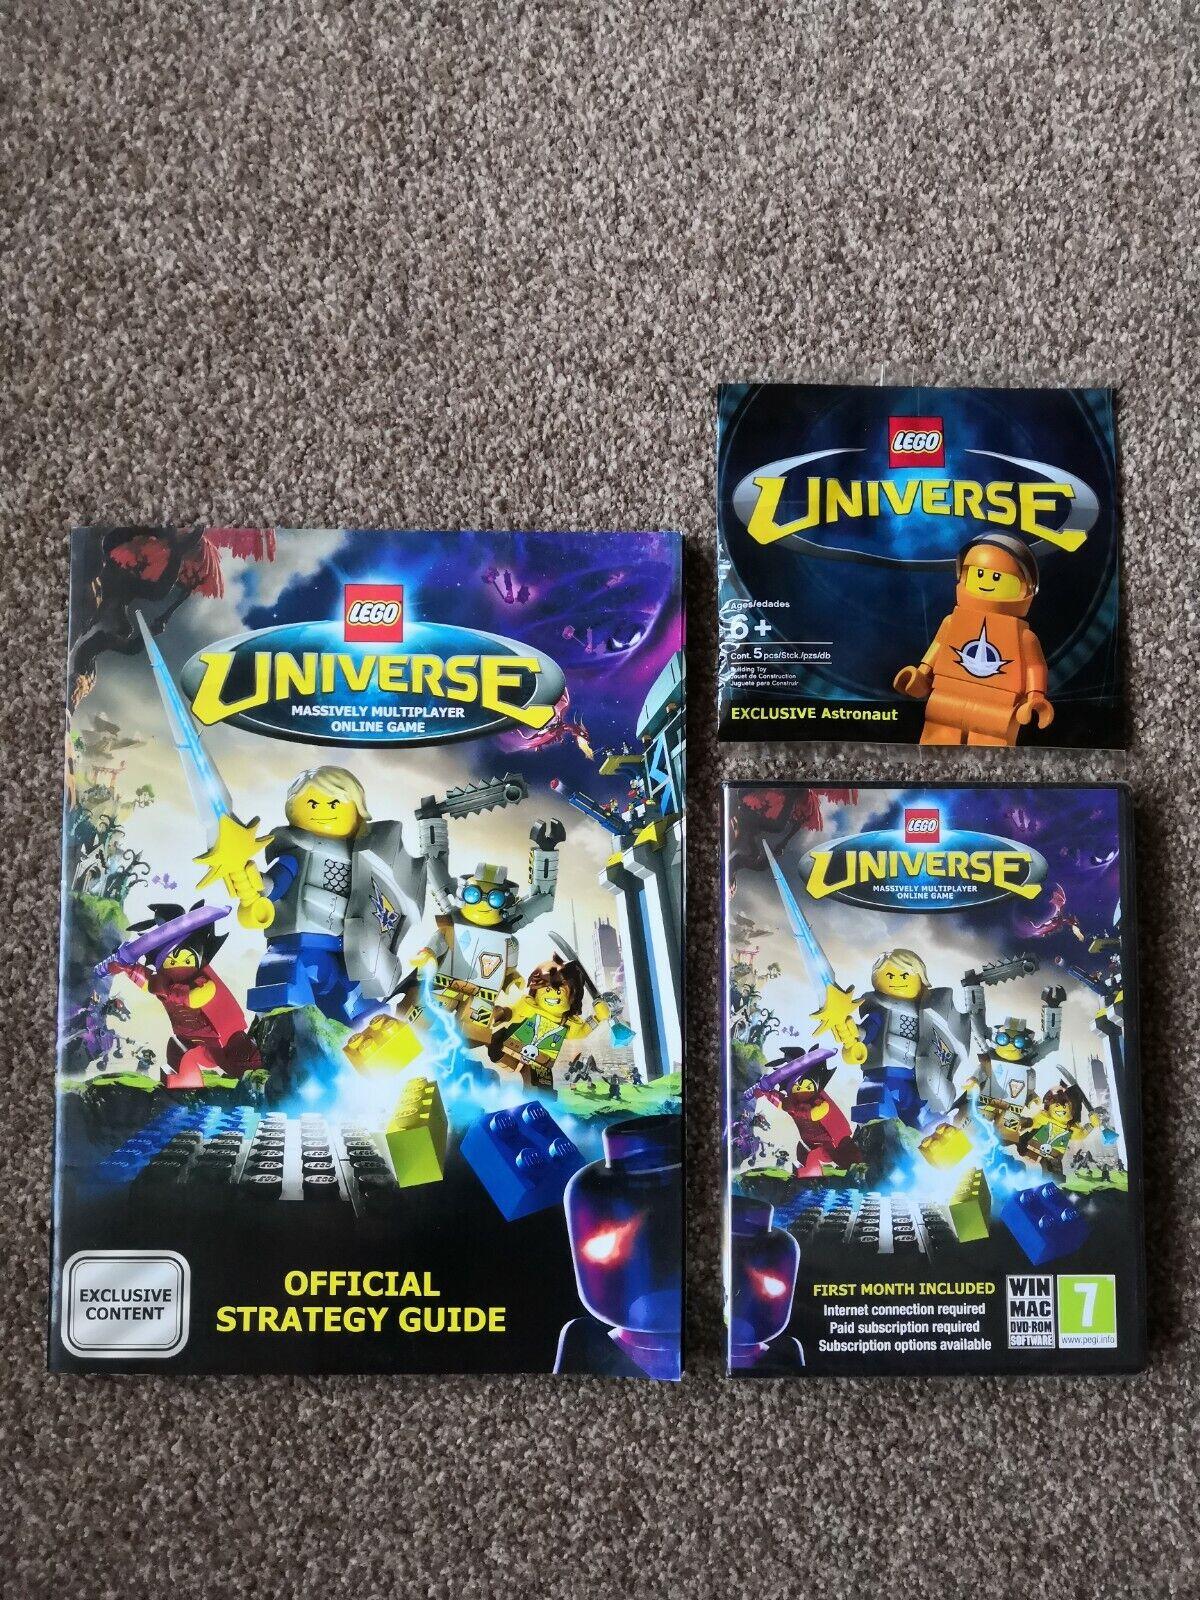 Lego Lego Lego Universe Minifigure, Guide And Pc Disc Lego History. 1504a2